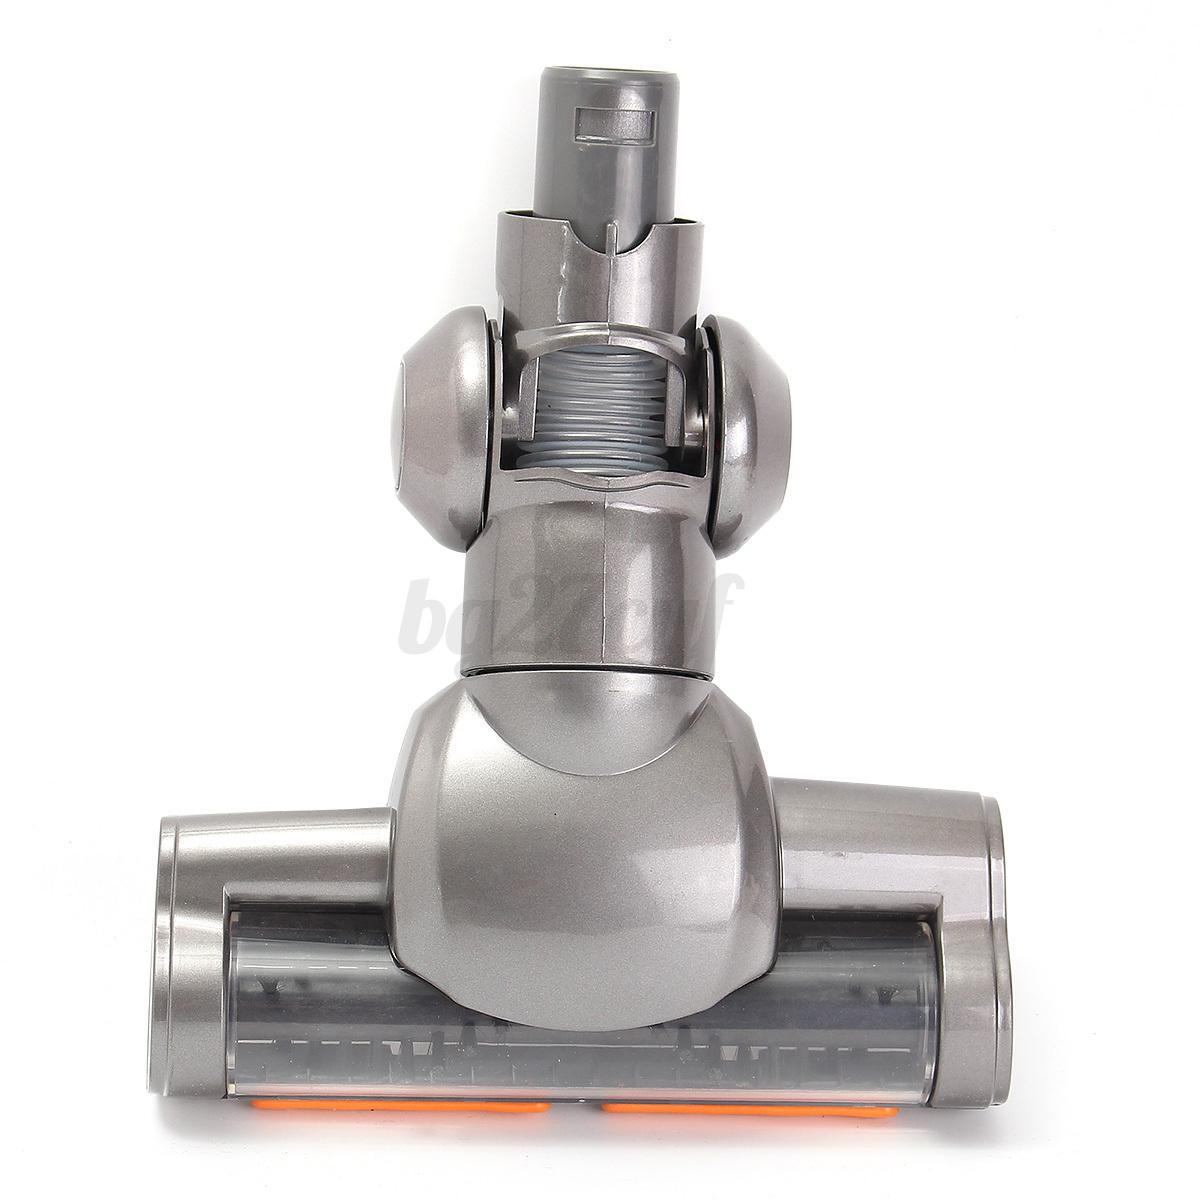 For dyson dc35 dc34 dc31 motorized floor tool brush vacuum for Dyson mini motorized tool uses